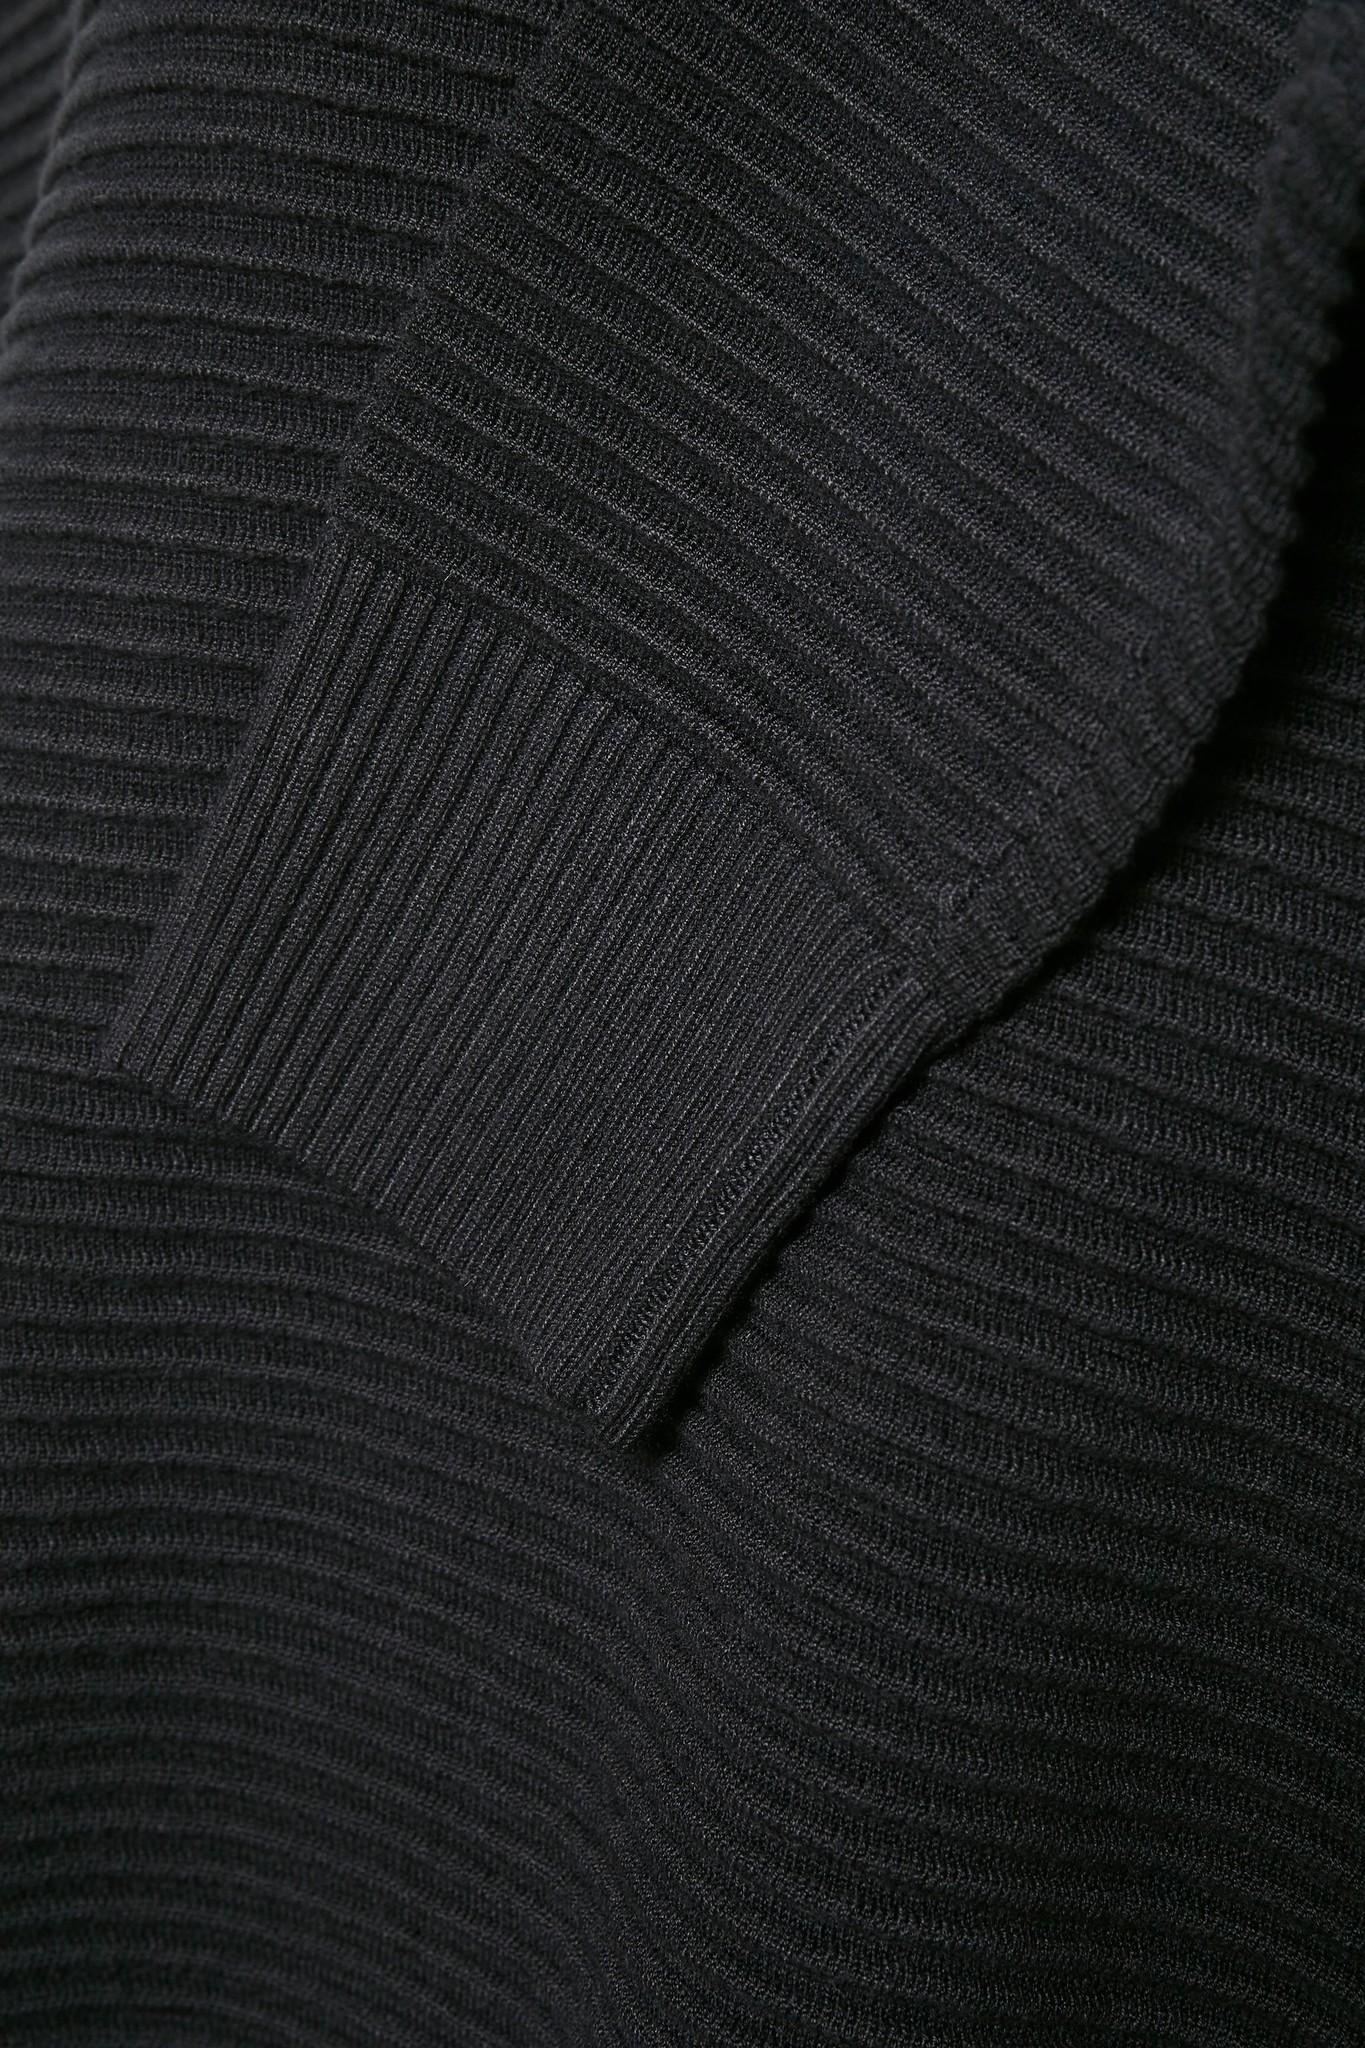 Tuniek KAberfin Black Deep-7